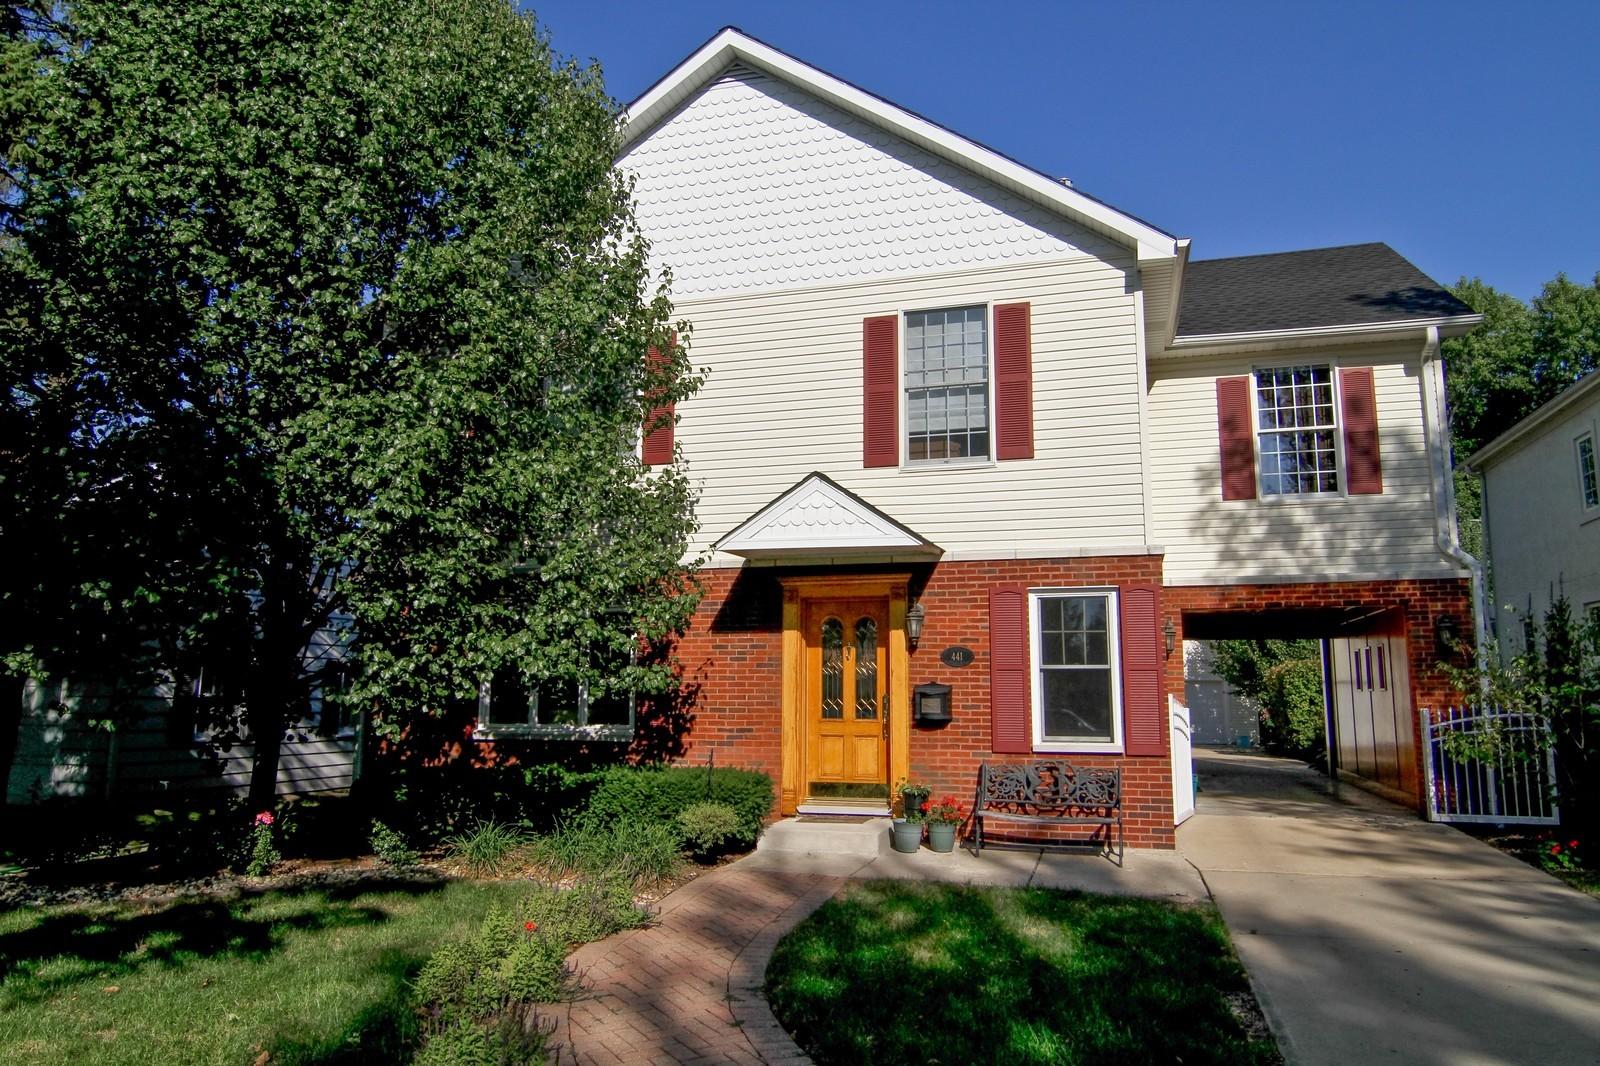 Real Estate Photography - 441 Edgewood Dr, La Grange, IL, 60525 - Front View